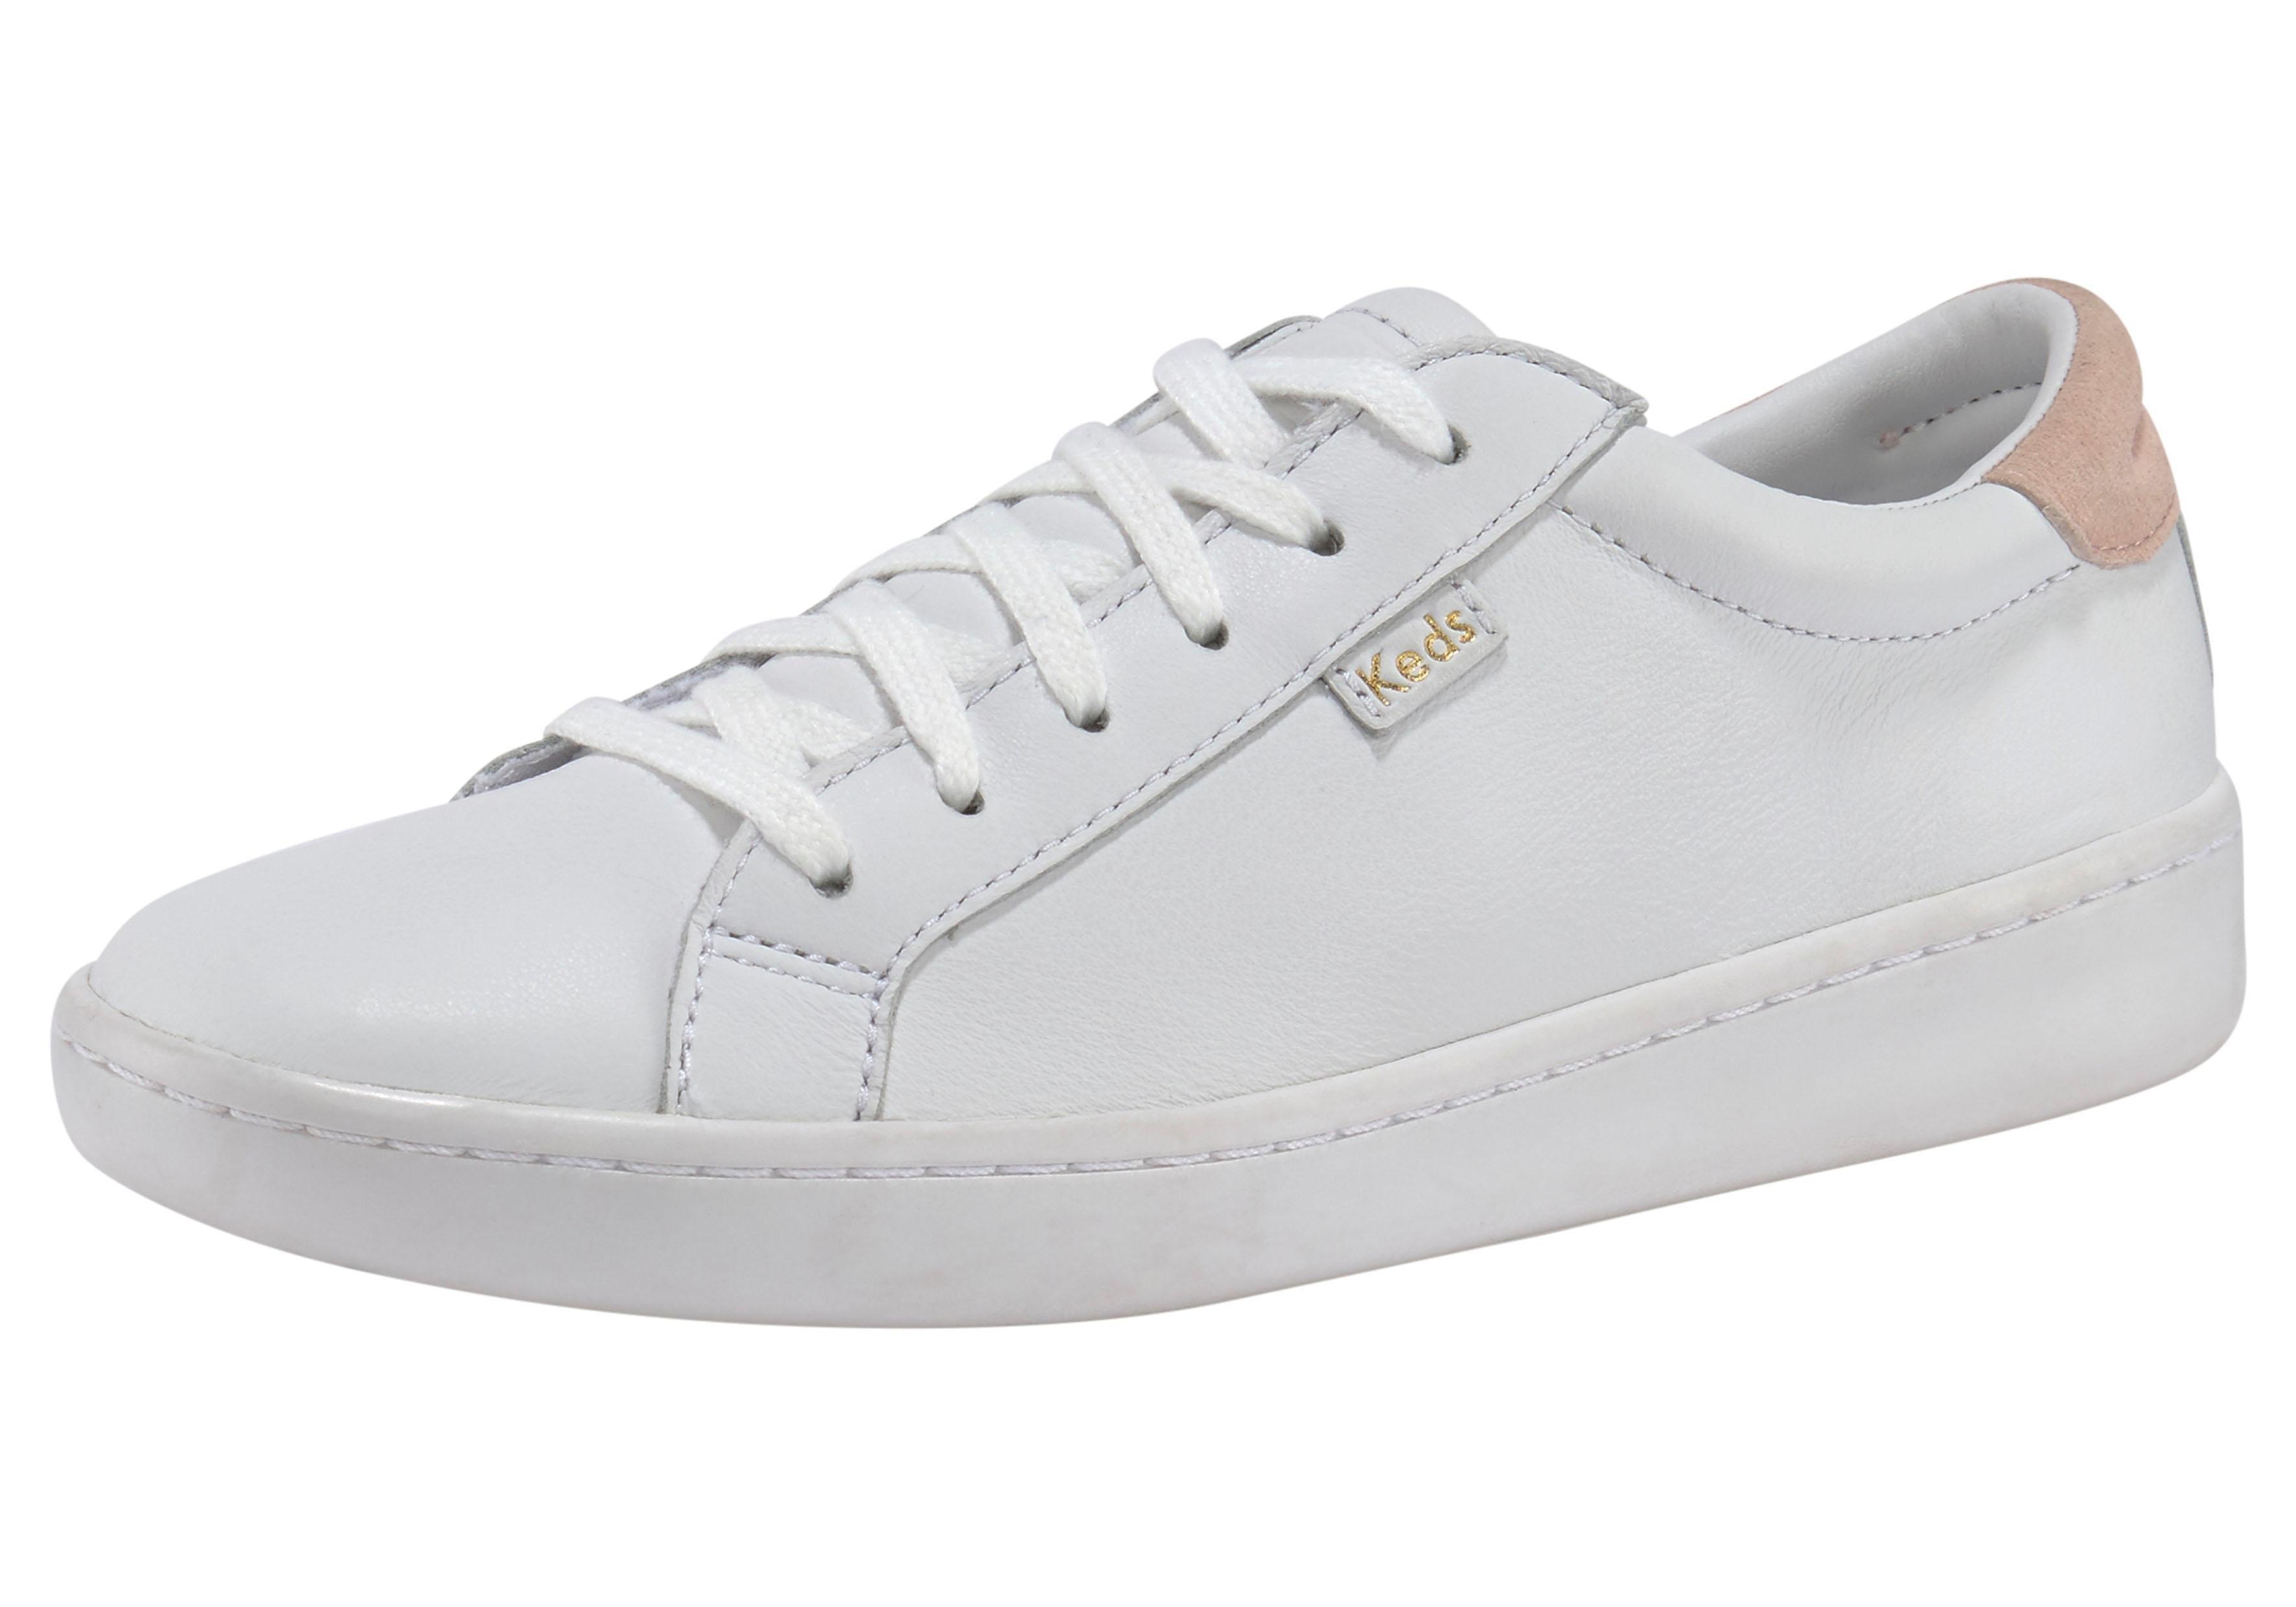 Keds sneakers »Ace Ltt Leather« bestellen: 14 dagen bedenktijd